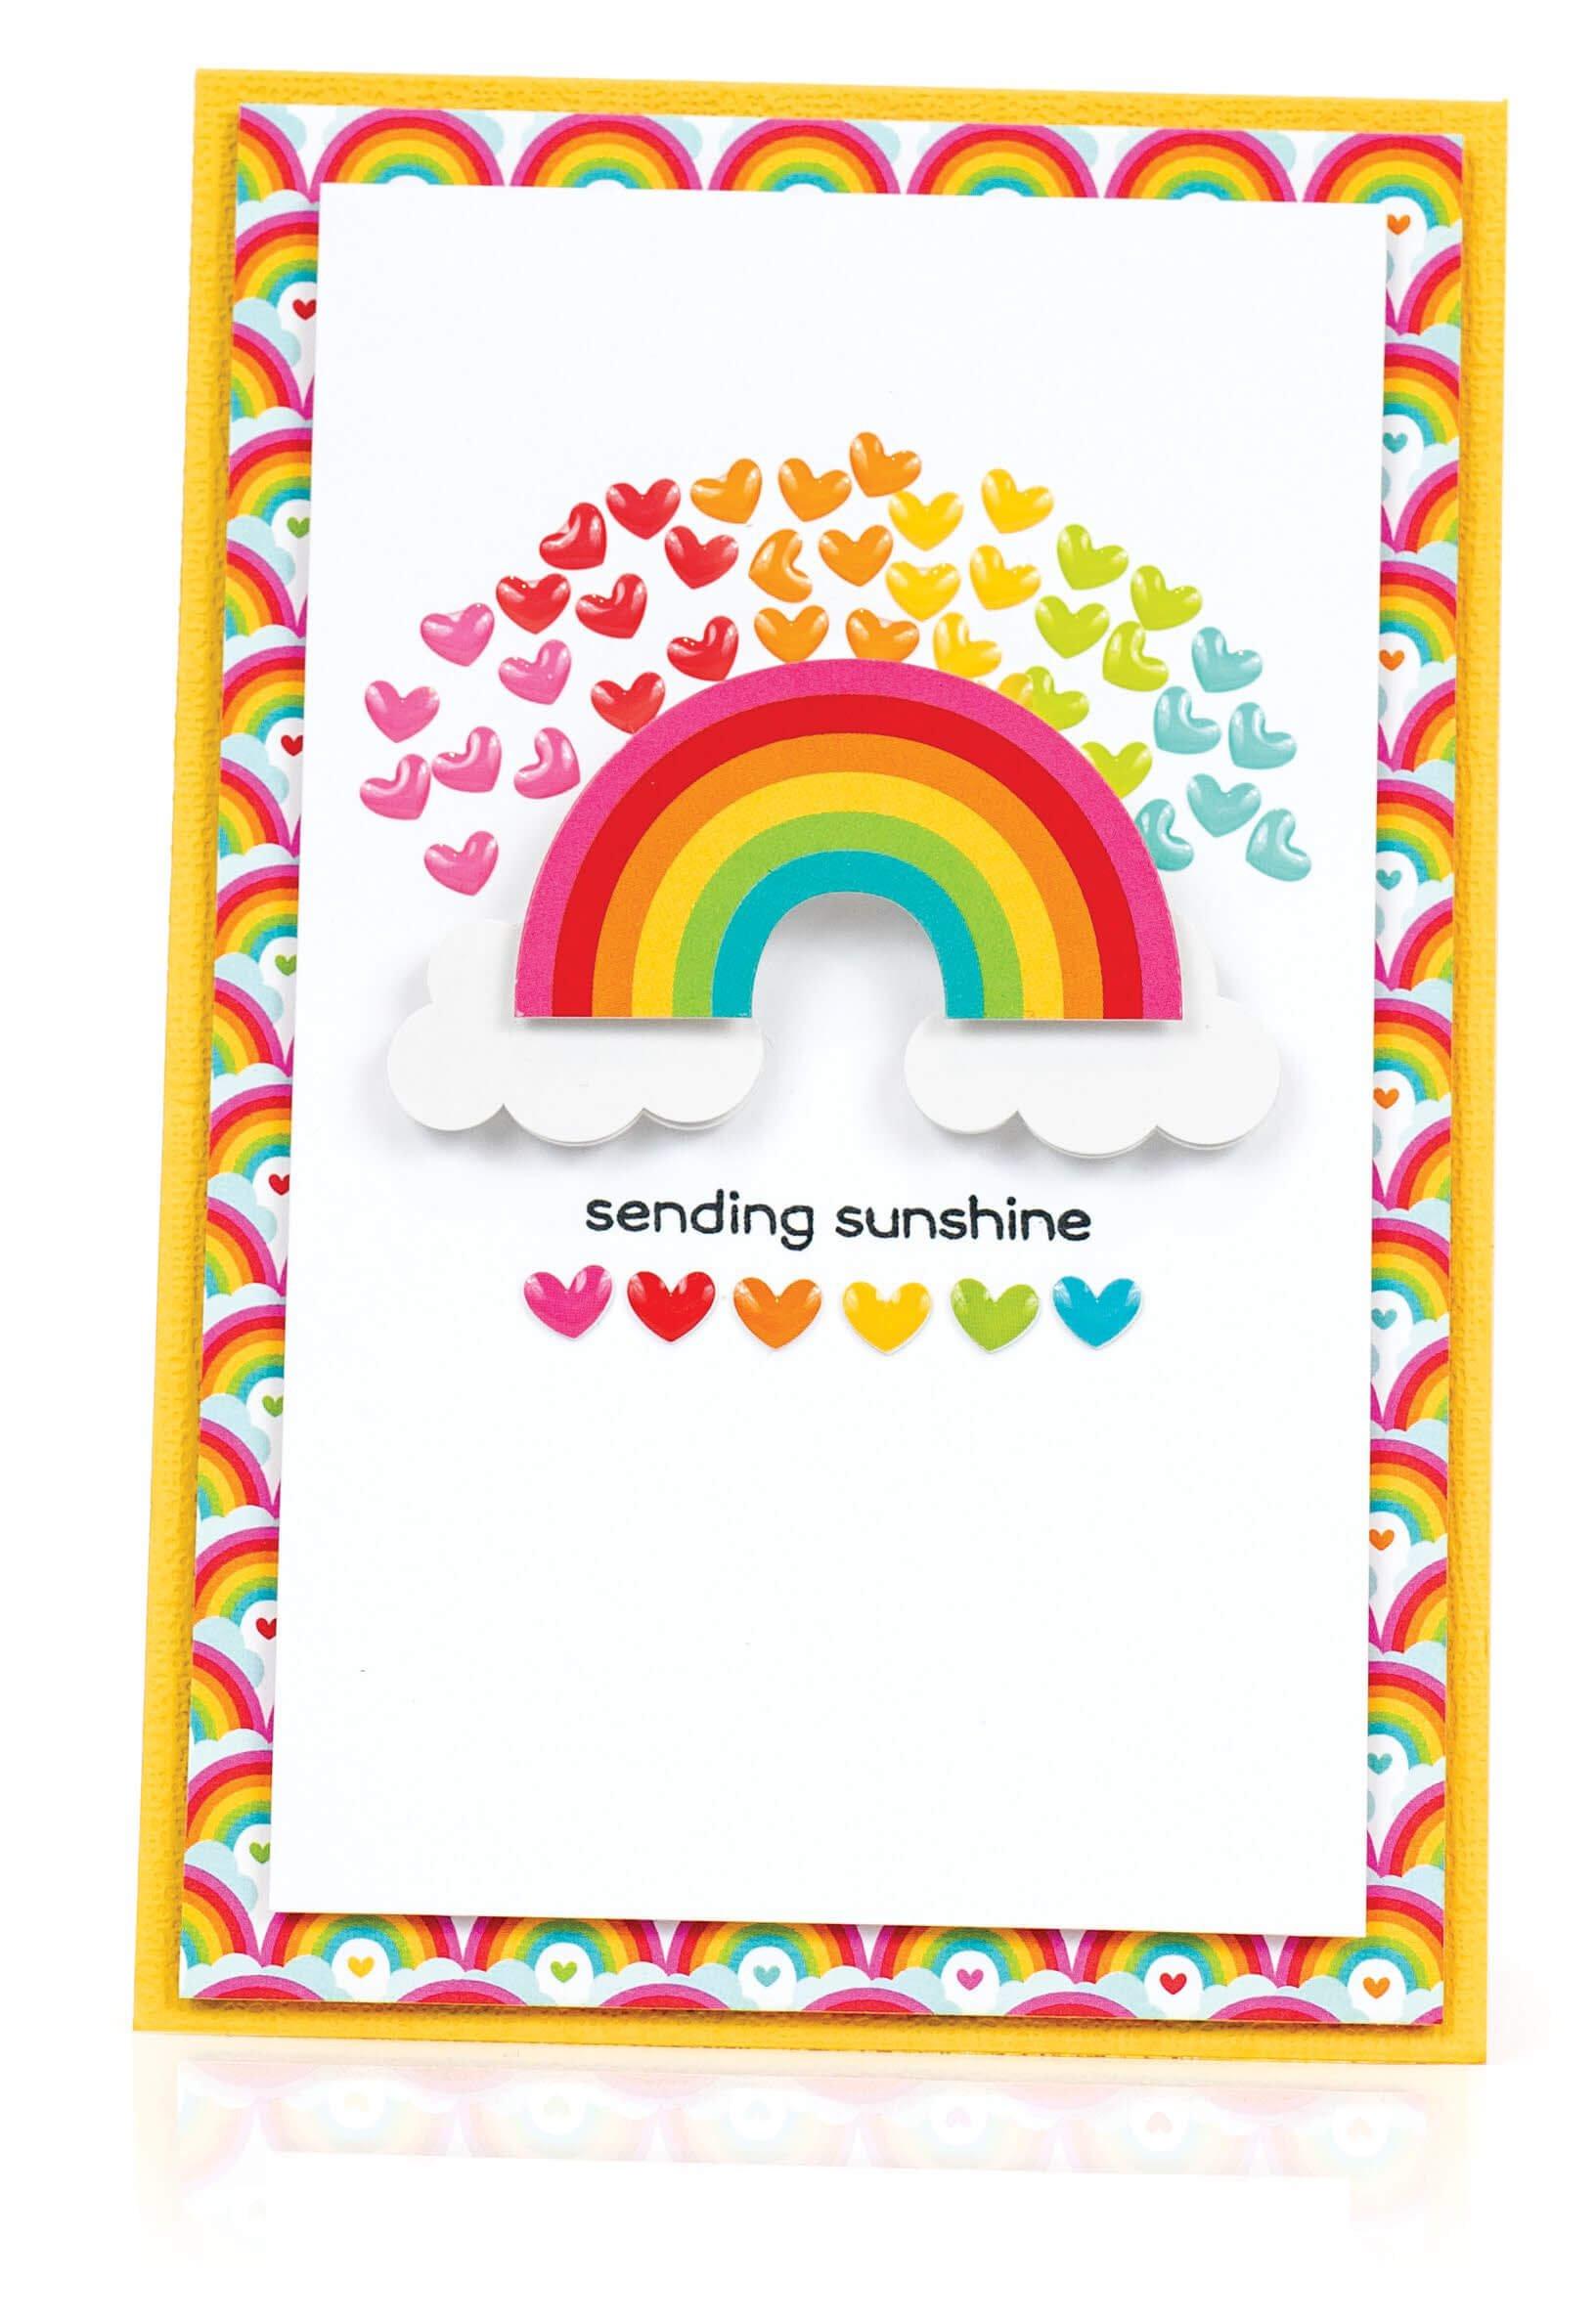 Scrapbook & Cards Today - Summer 2019 - Sending Sunshine card by Latisha Yoast